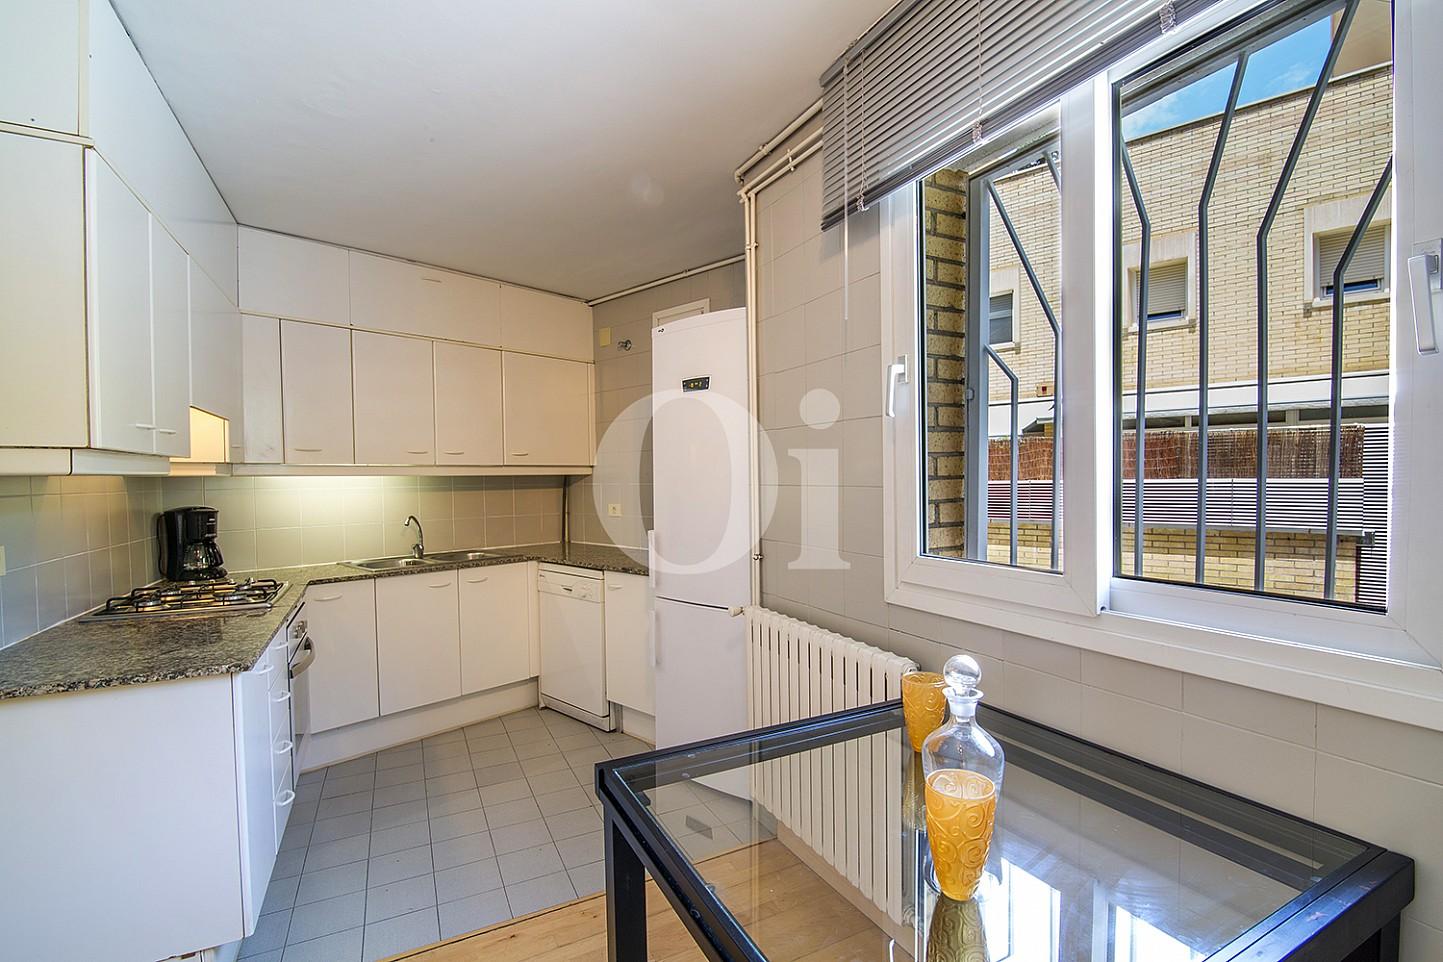 Sensacional cocina equipada e independiente en fabulosa casa en venta situada en Vila Olimpica, Barcelona